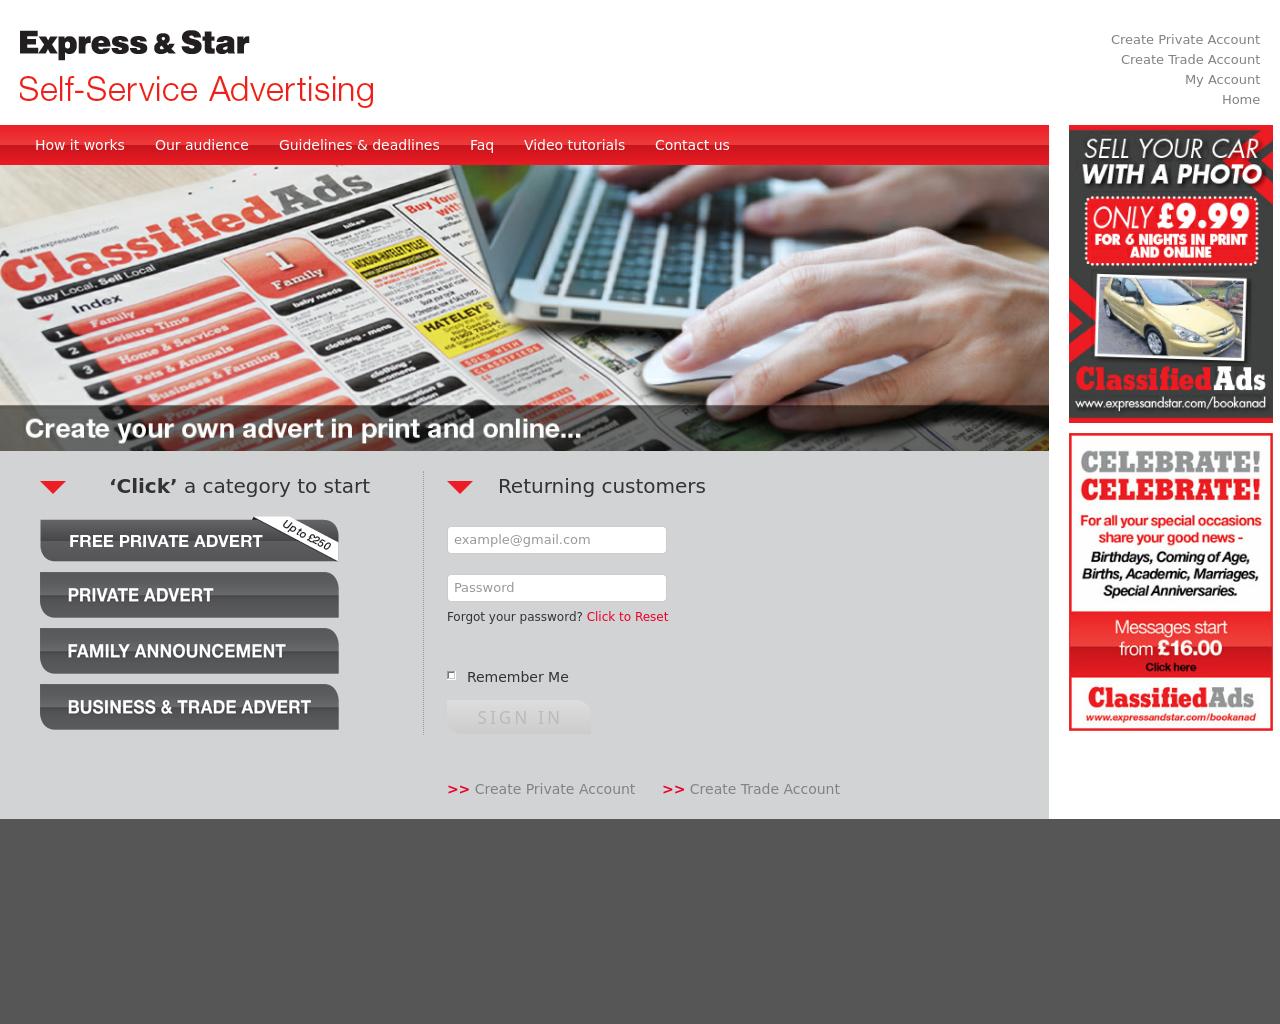 Express-&-Star-Advertising-Reviews-Pricing